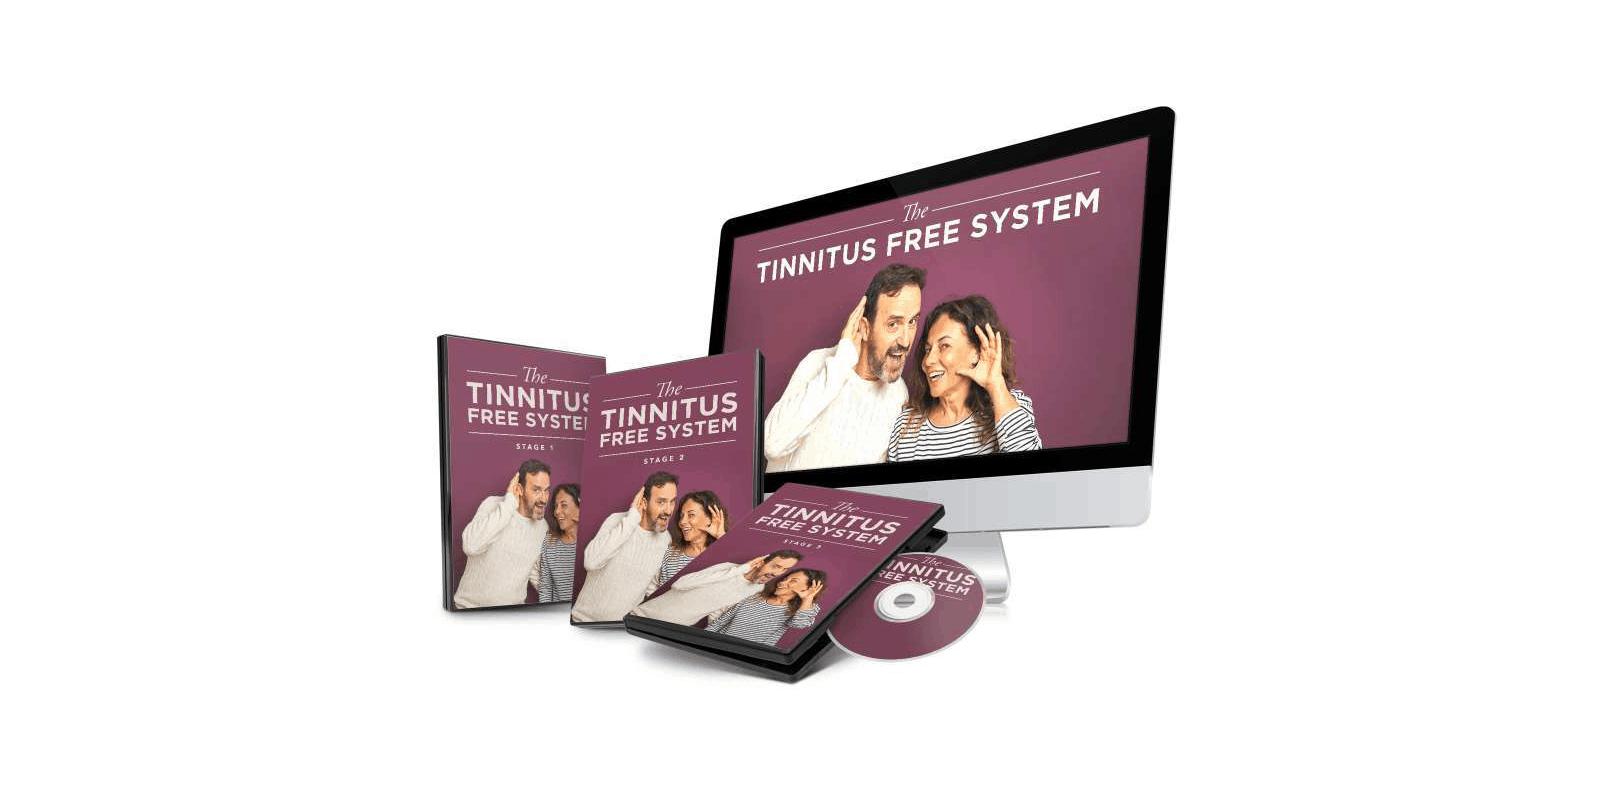 The Tinnitus Free System reviews